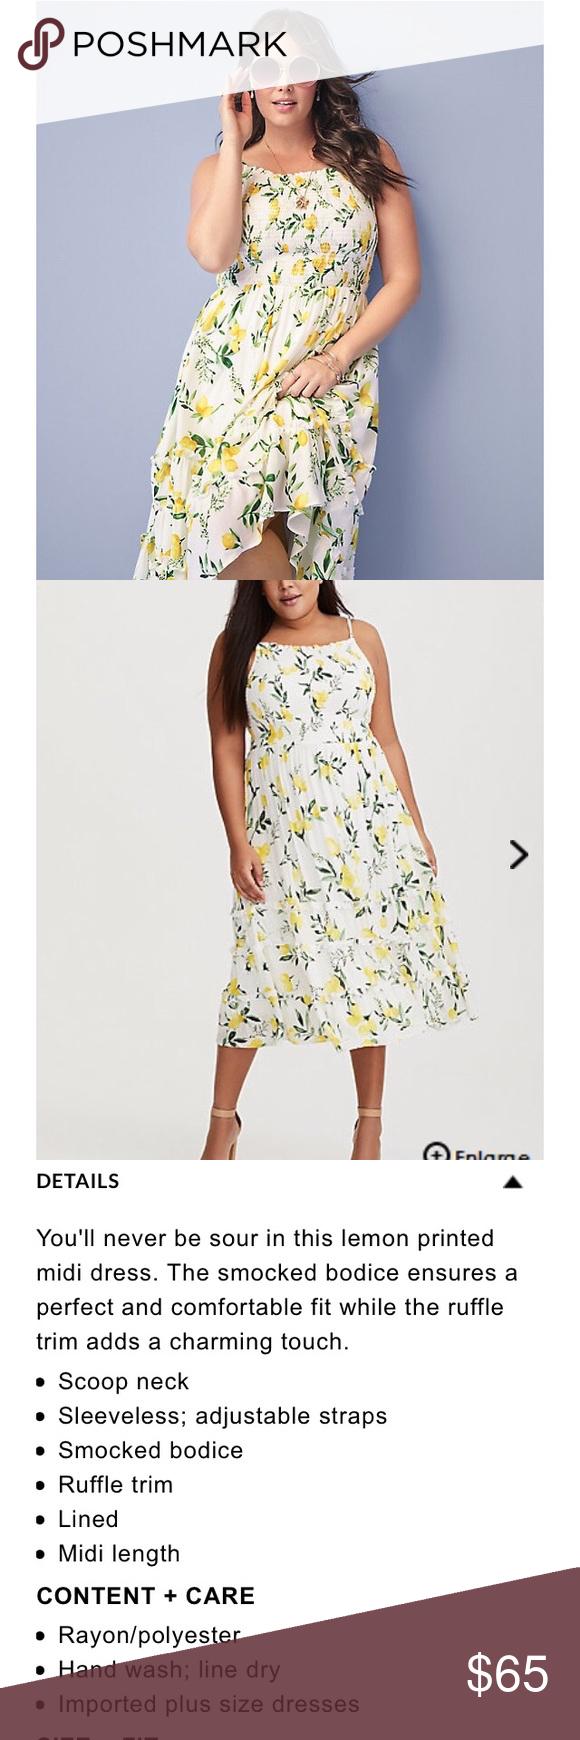 b010a3faa27e Torrid smocked lemon midi dress. NWT Torrid lemon-print midi dress with  smocked bodice